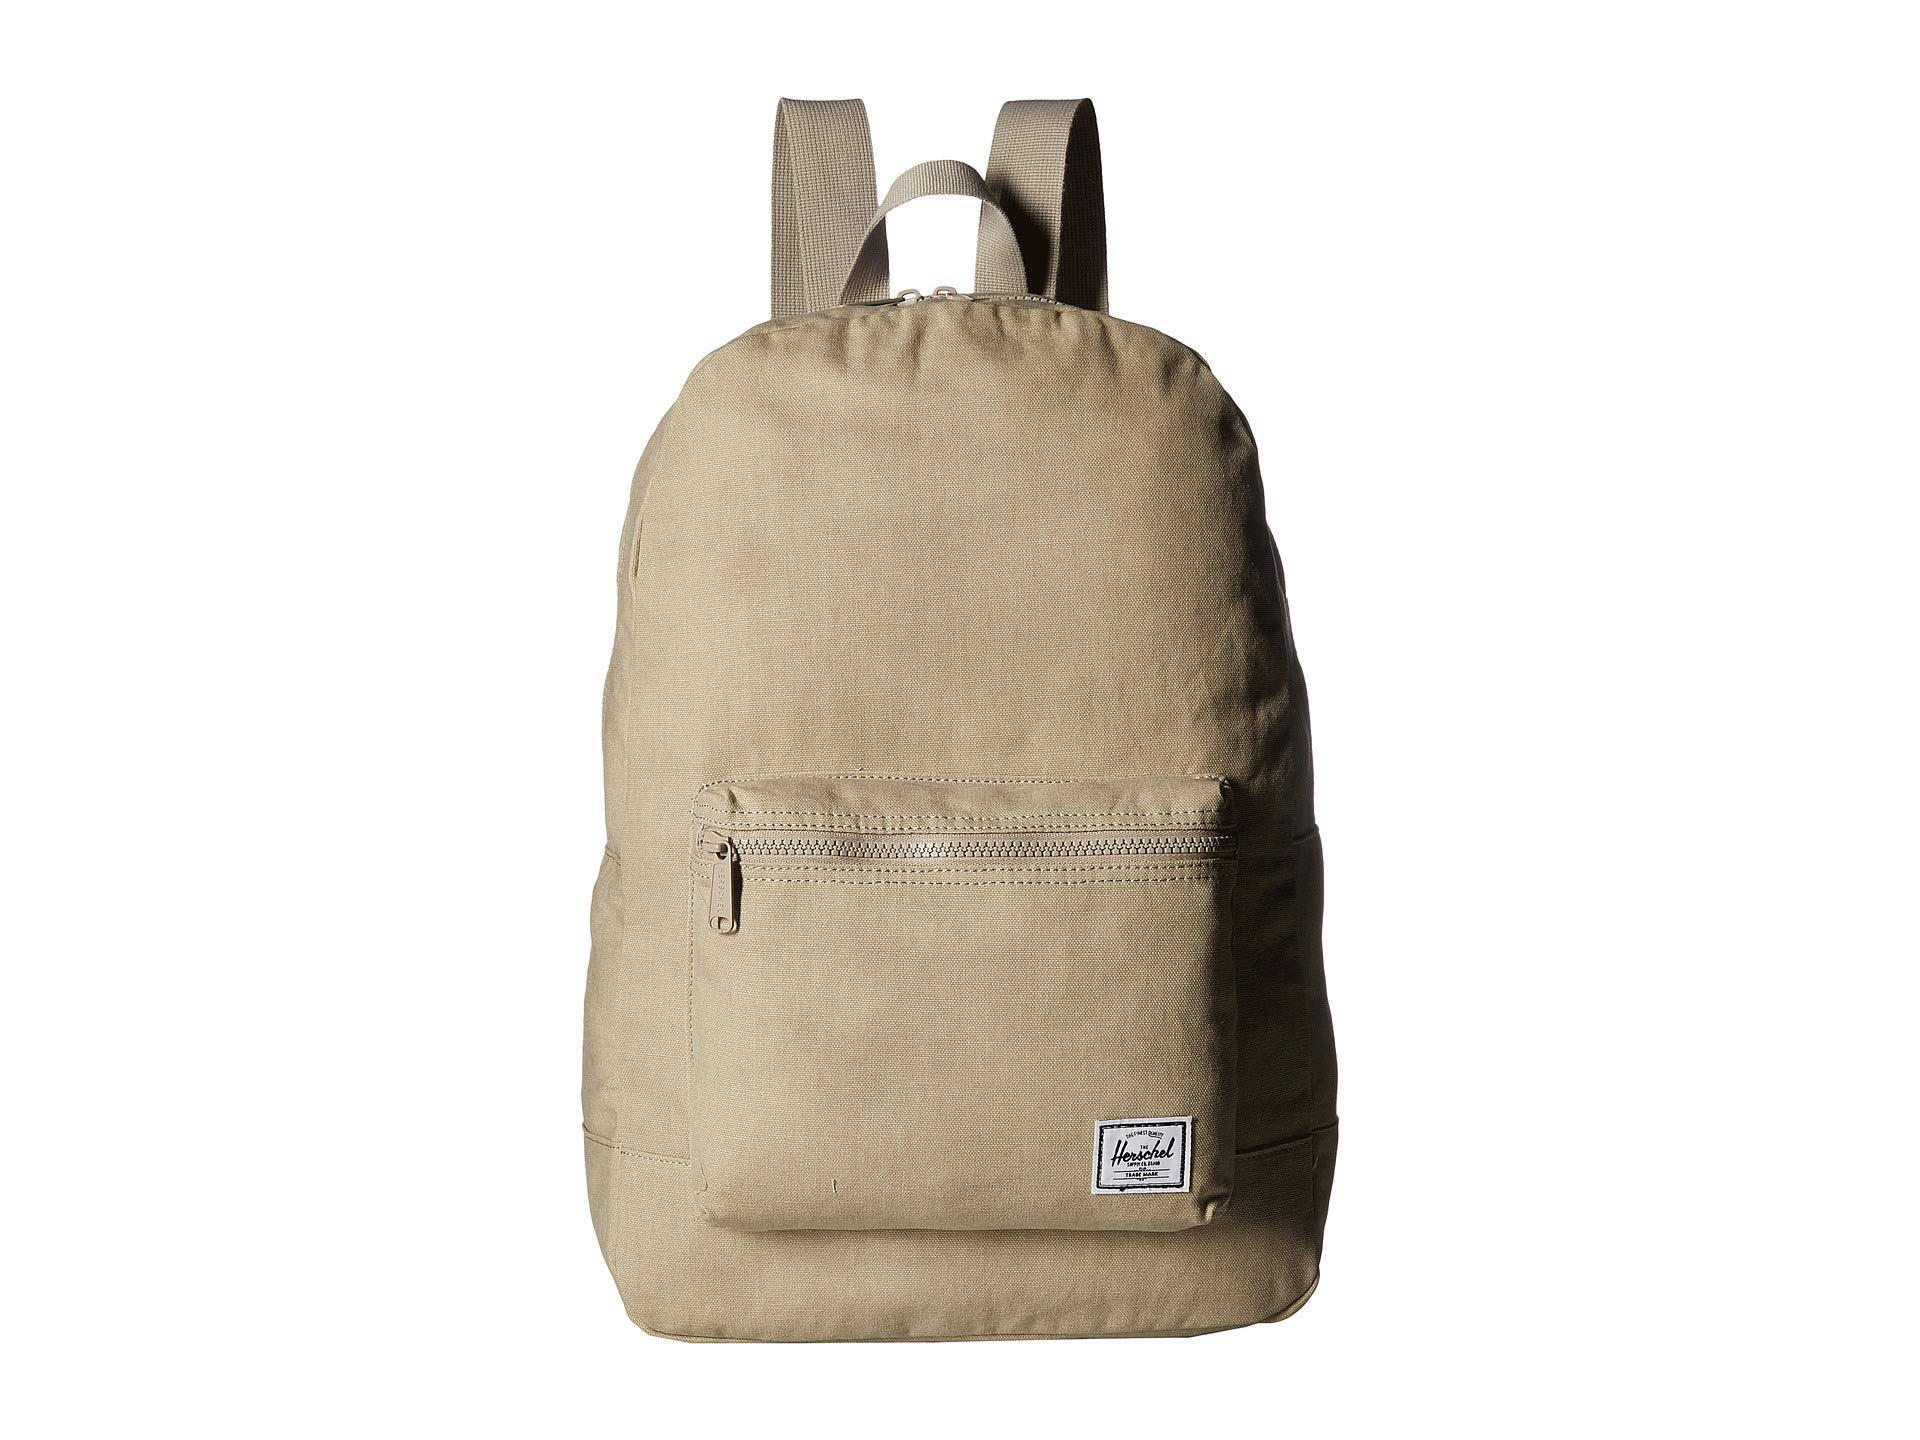 Herschel Supply Co. Men s Packable Daypack (multi Reflective) Backpack Bags e6e91e4f82